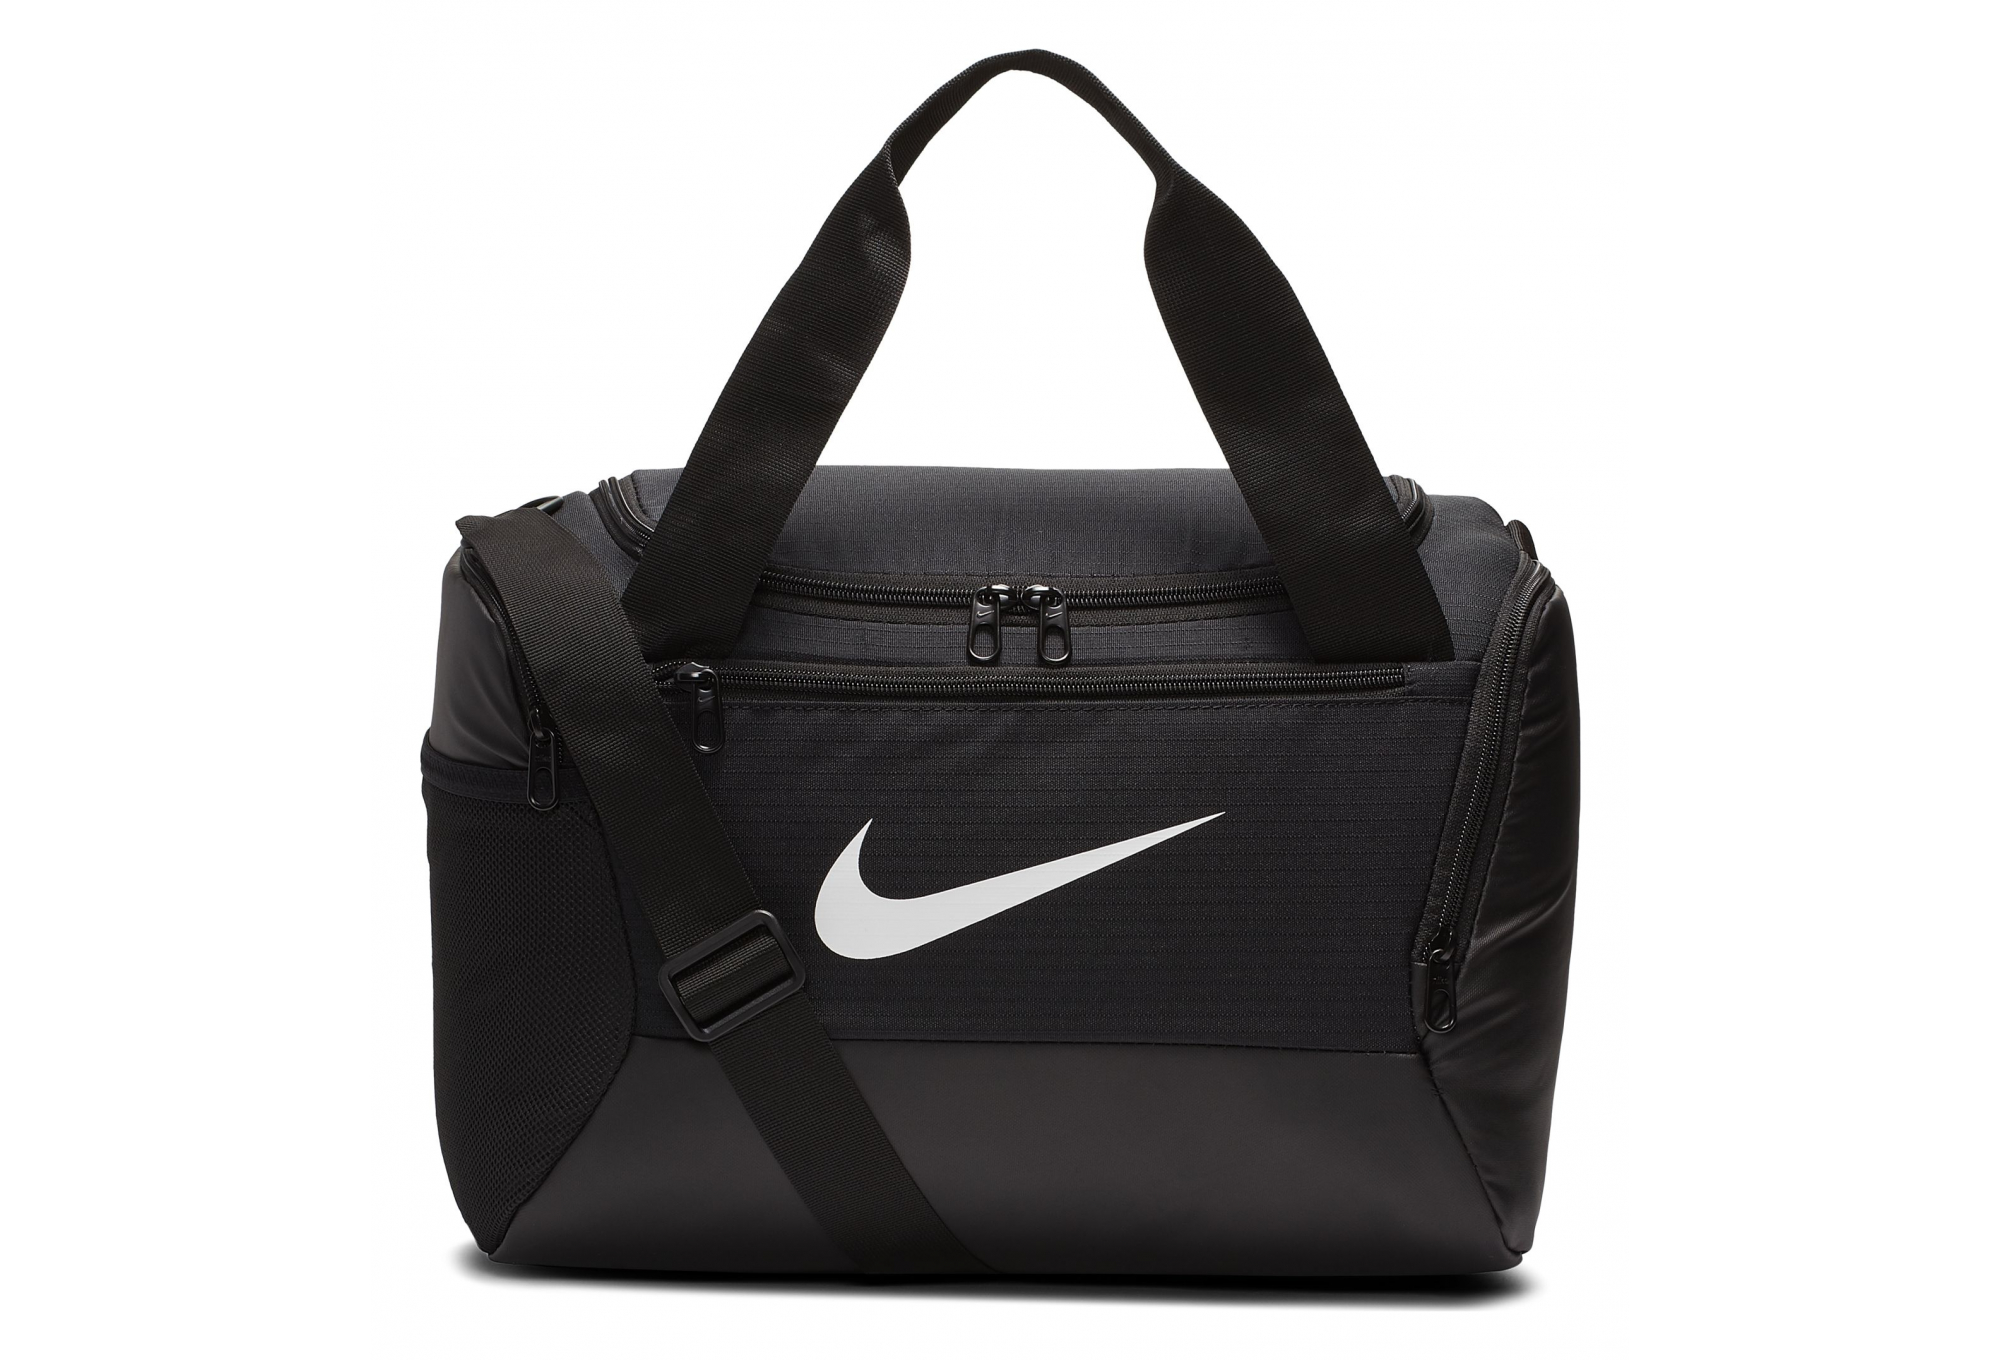 Sac de Sport Nike Brasilia X Small Noir